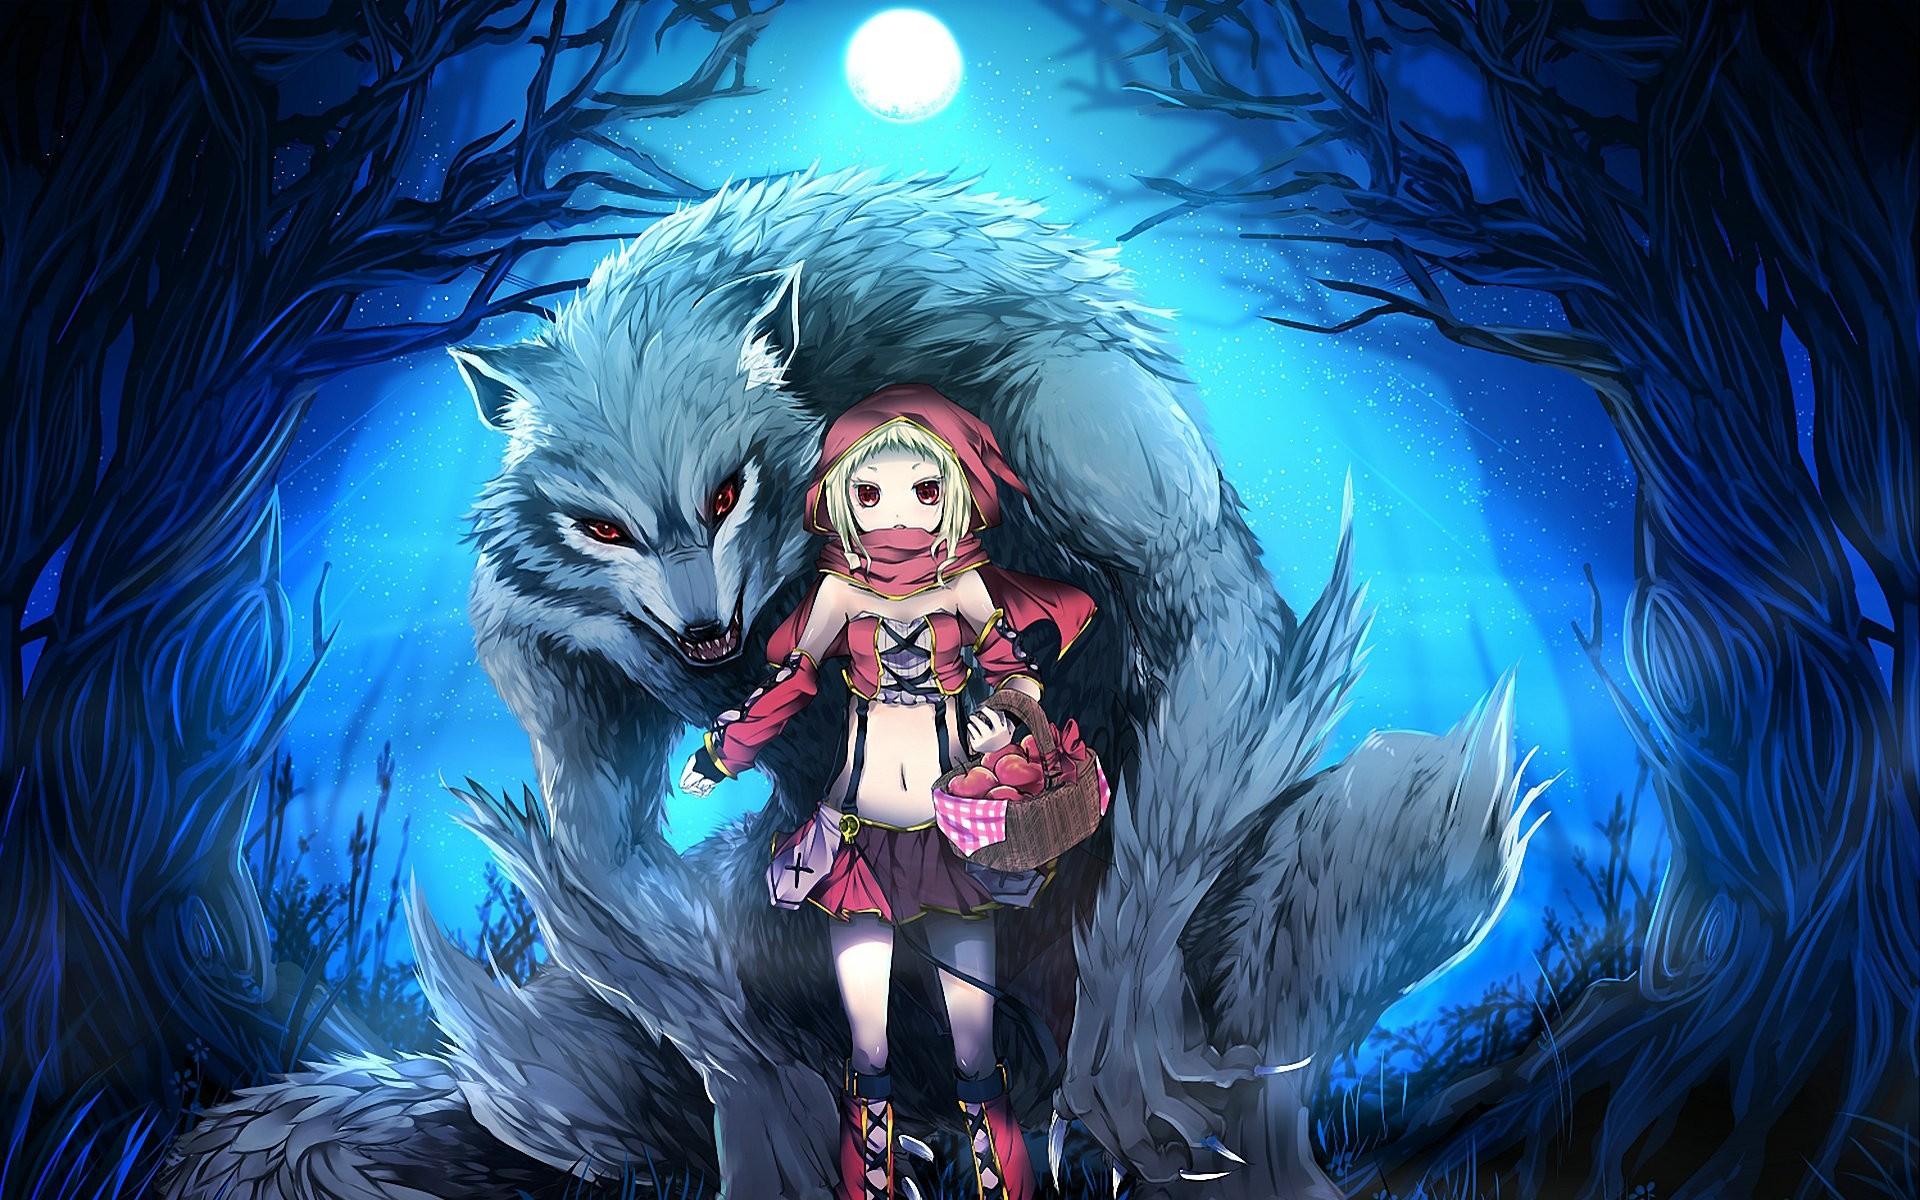 Wallpaper Illustration Fantasy Art Fantasy Girl Anime